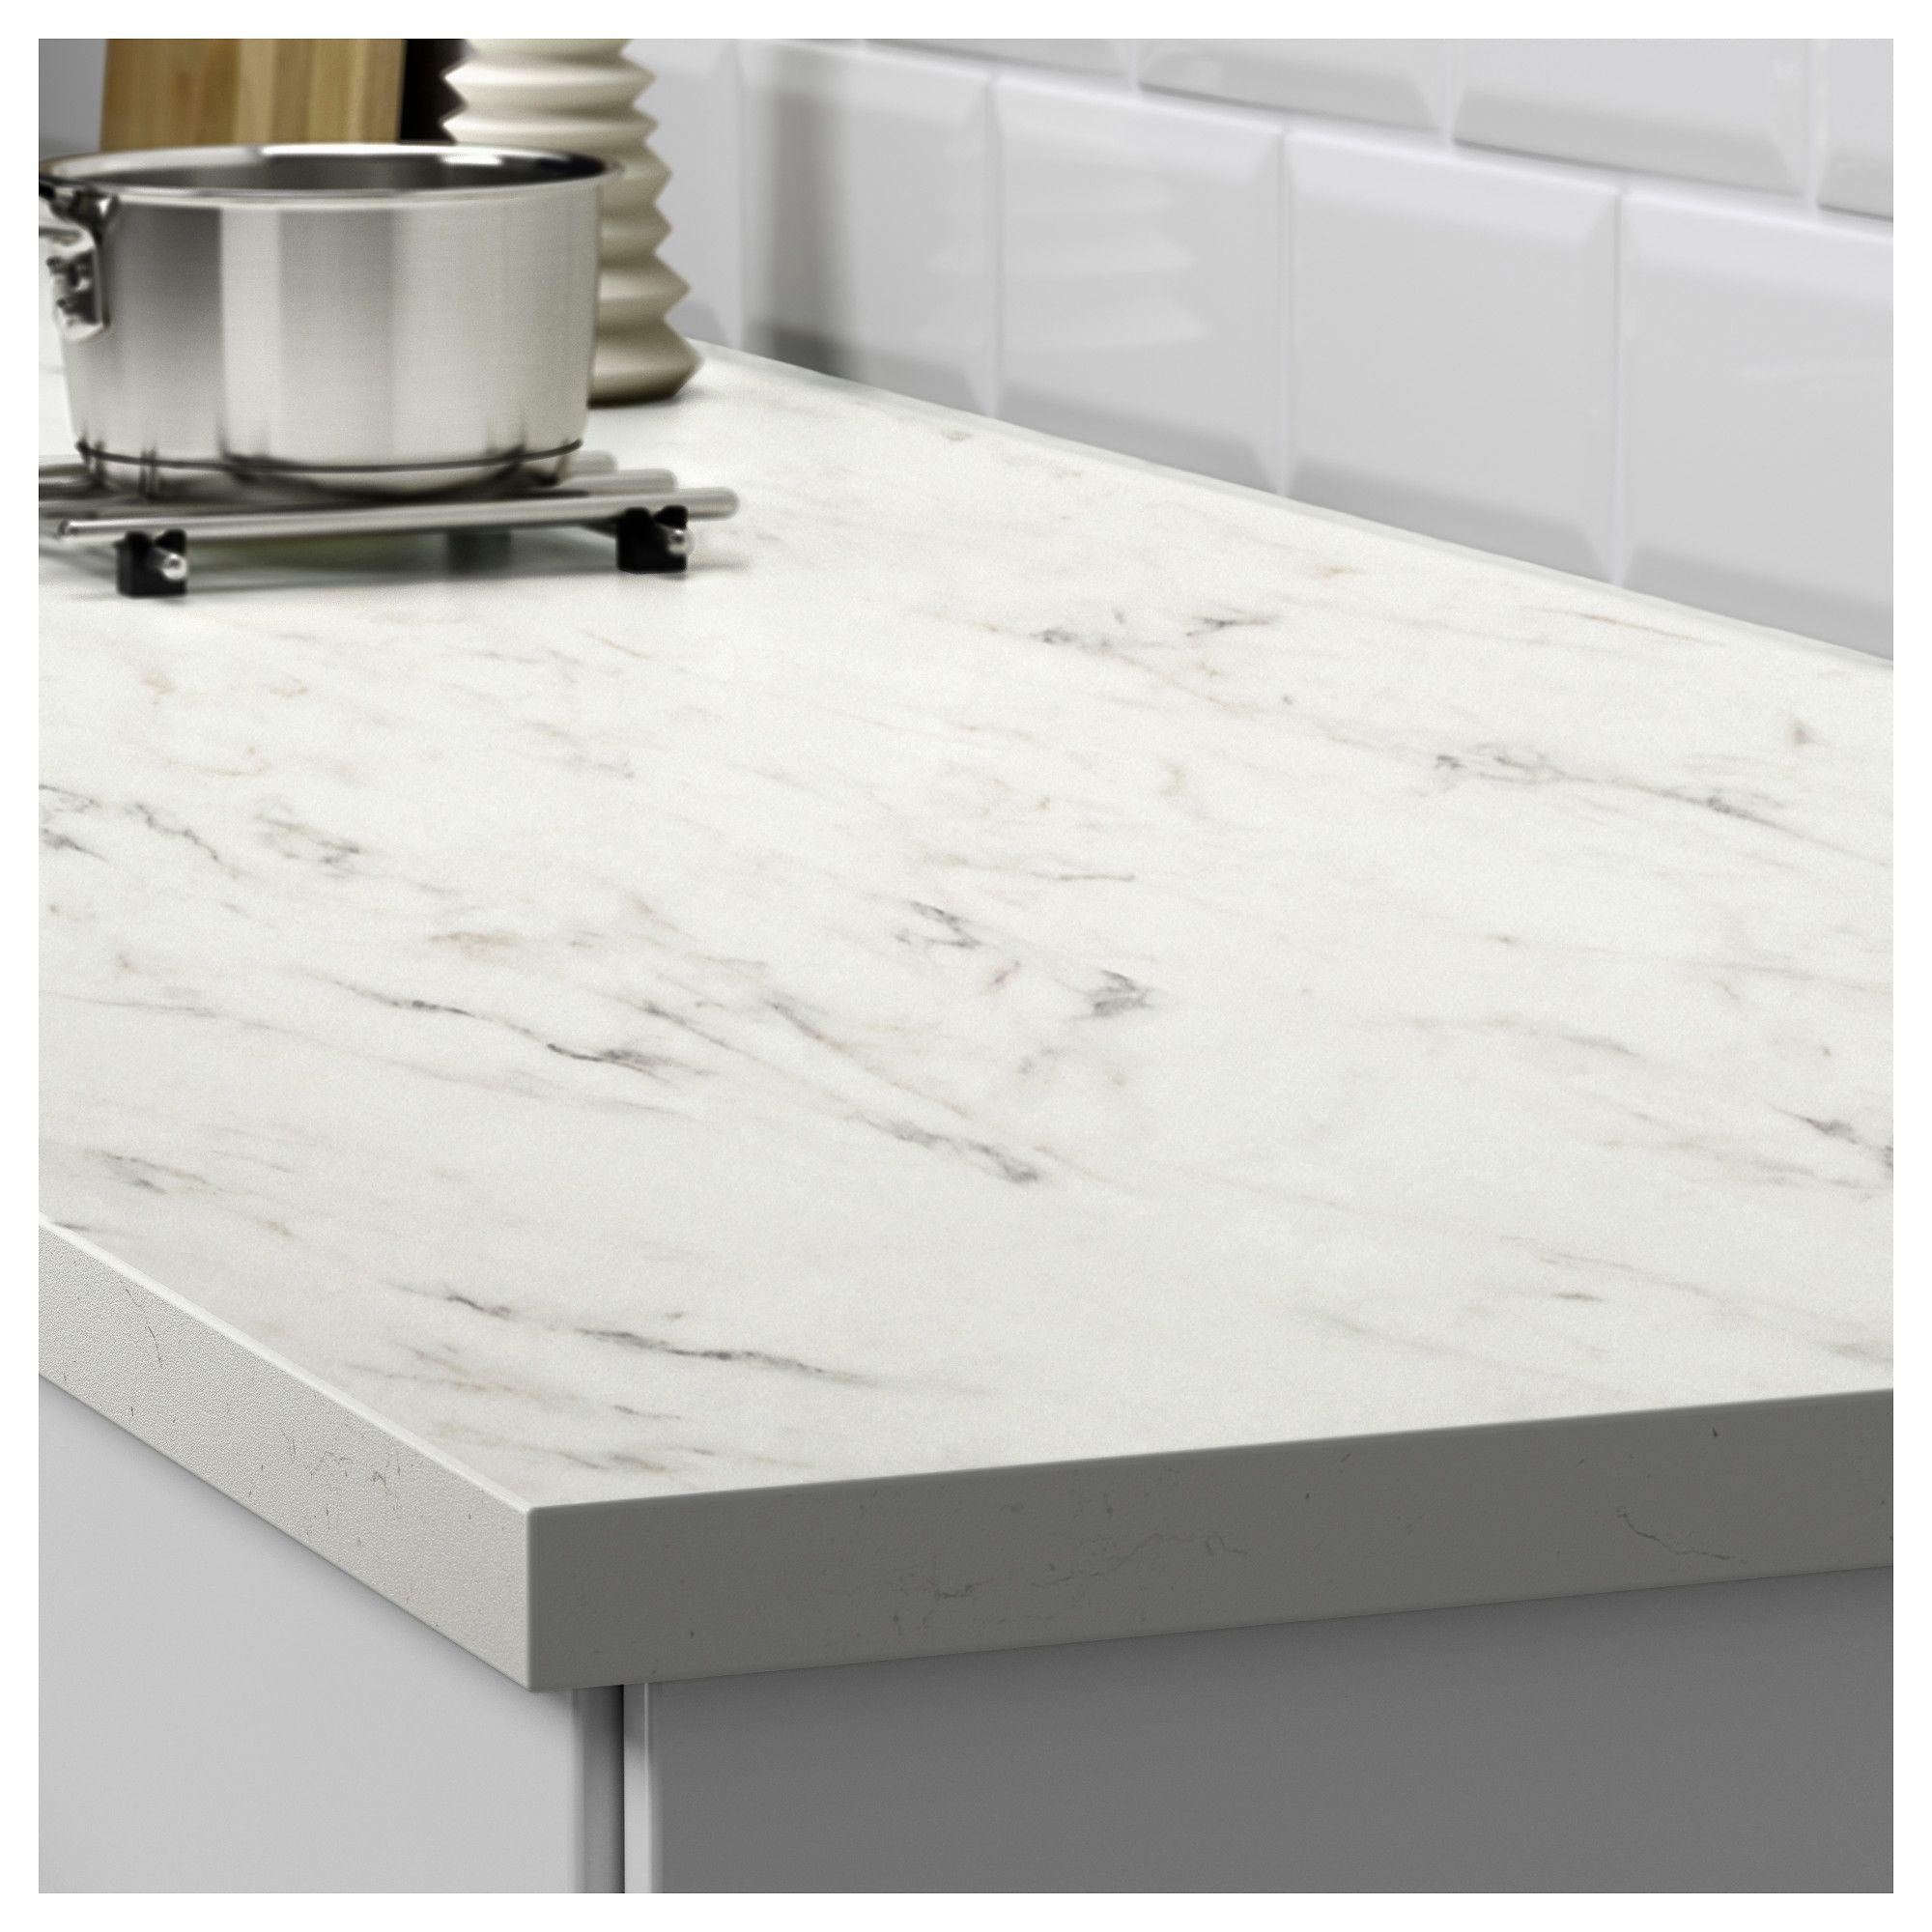 Ekbacken Countertop White Marble Effect Laminate 74x1 1 8